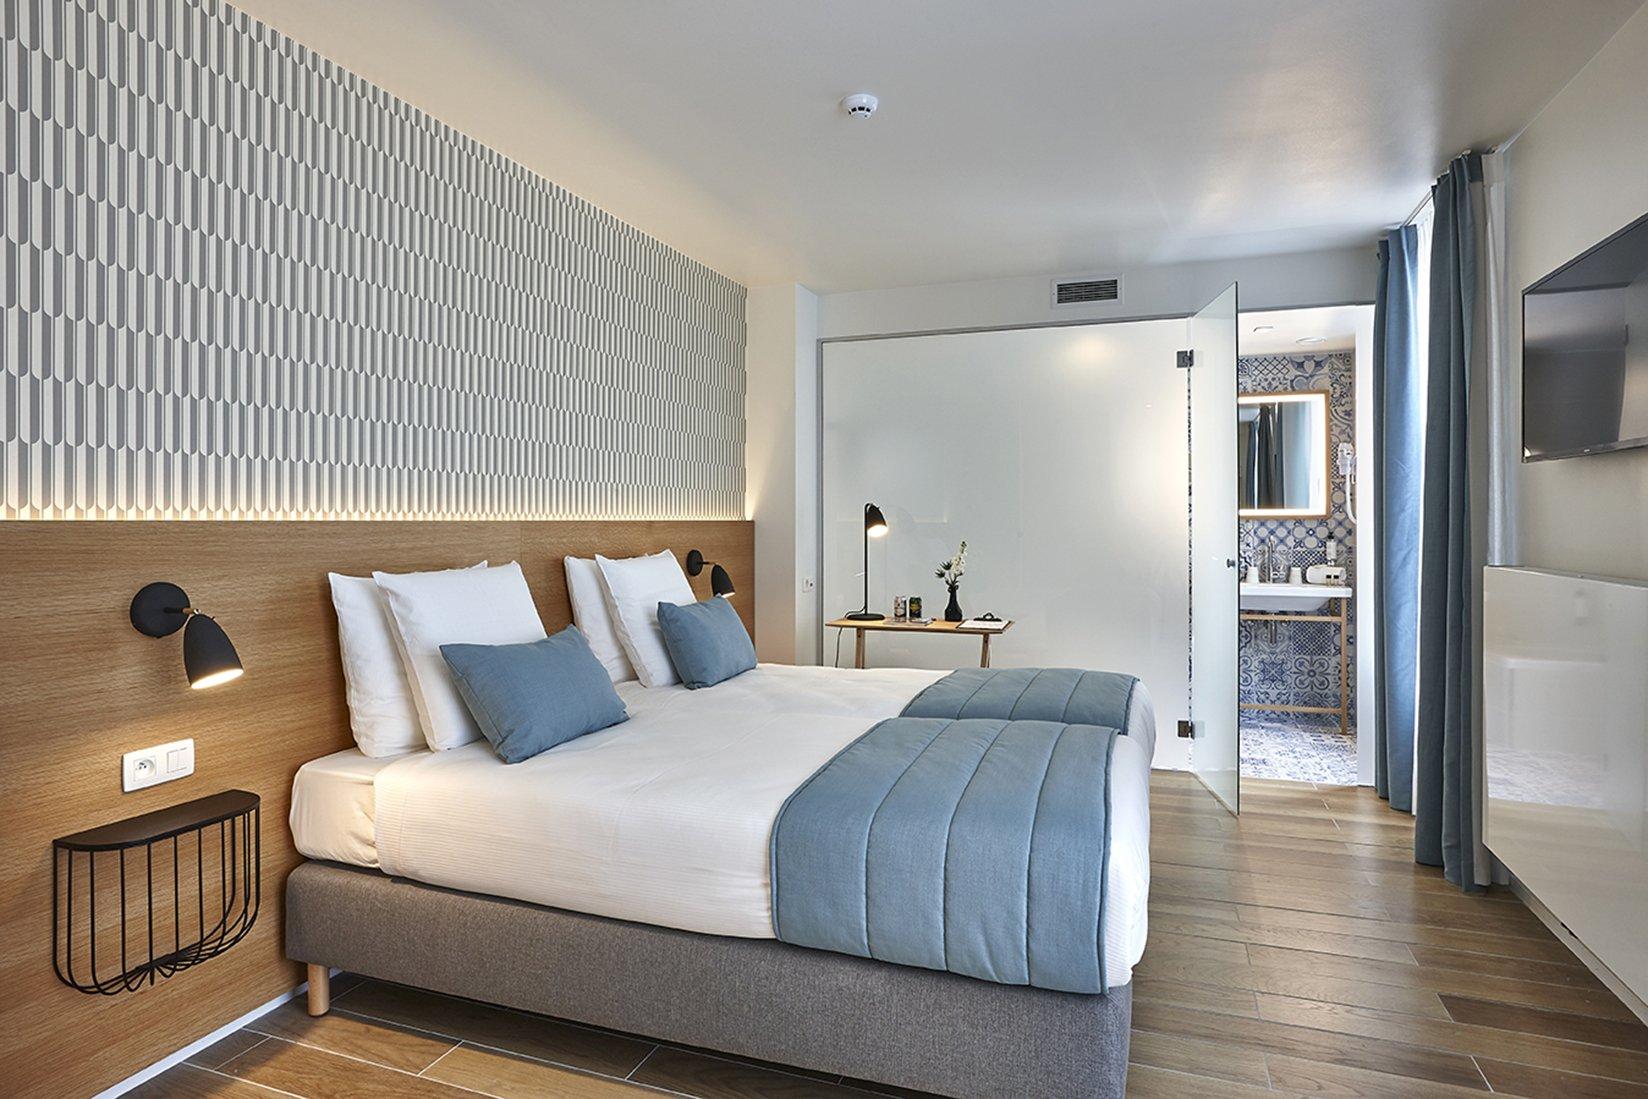 hygge hotel brussels belgium bedroom 2